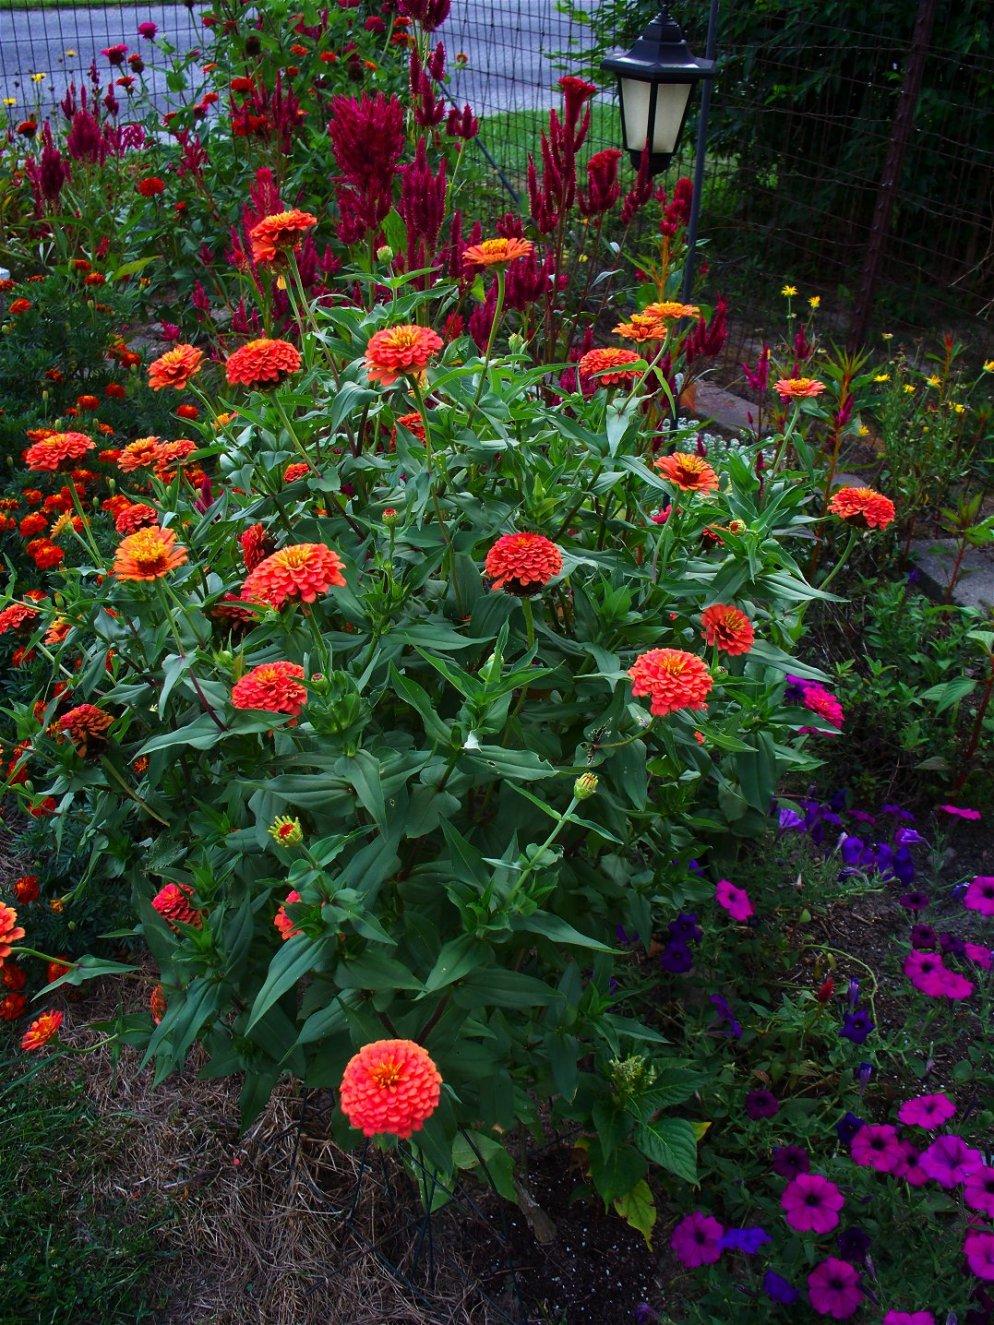 zinnias, marigolds, celosia, petunias